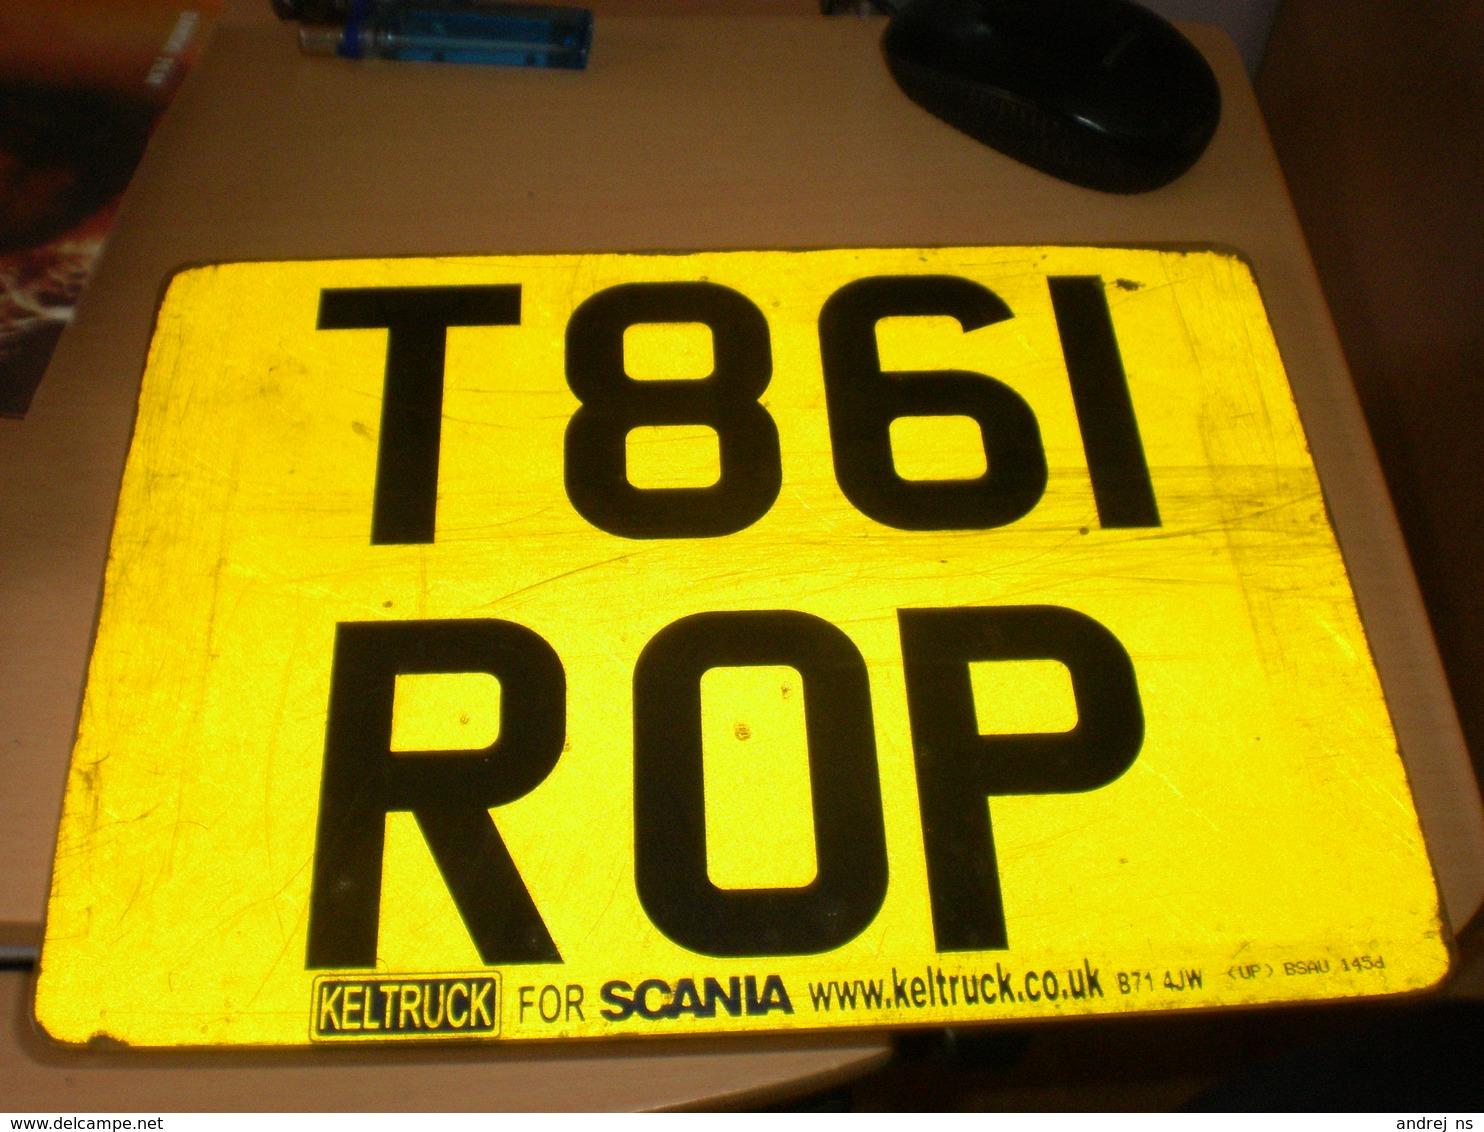 Number Plates Keltruck For Scania - Number Plates